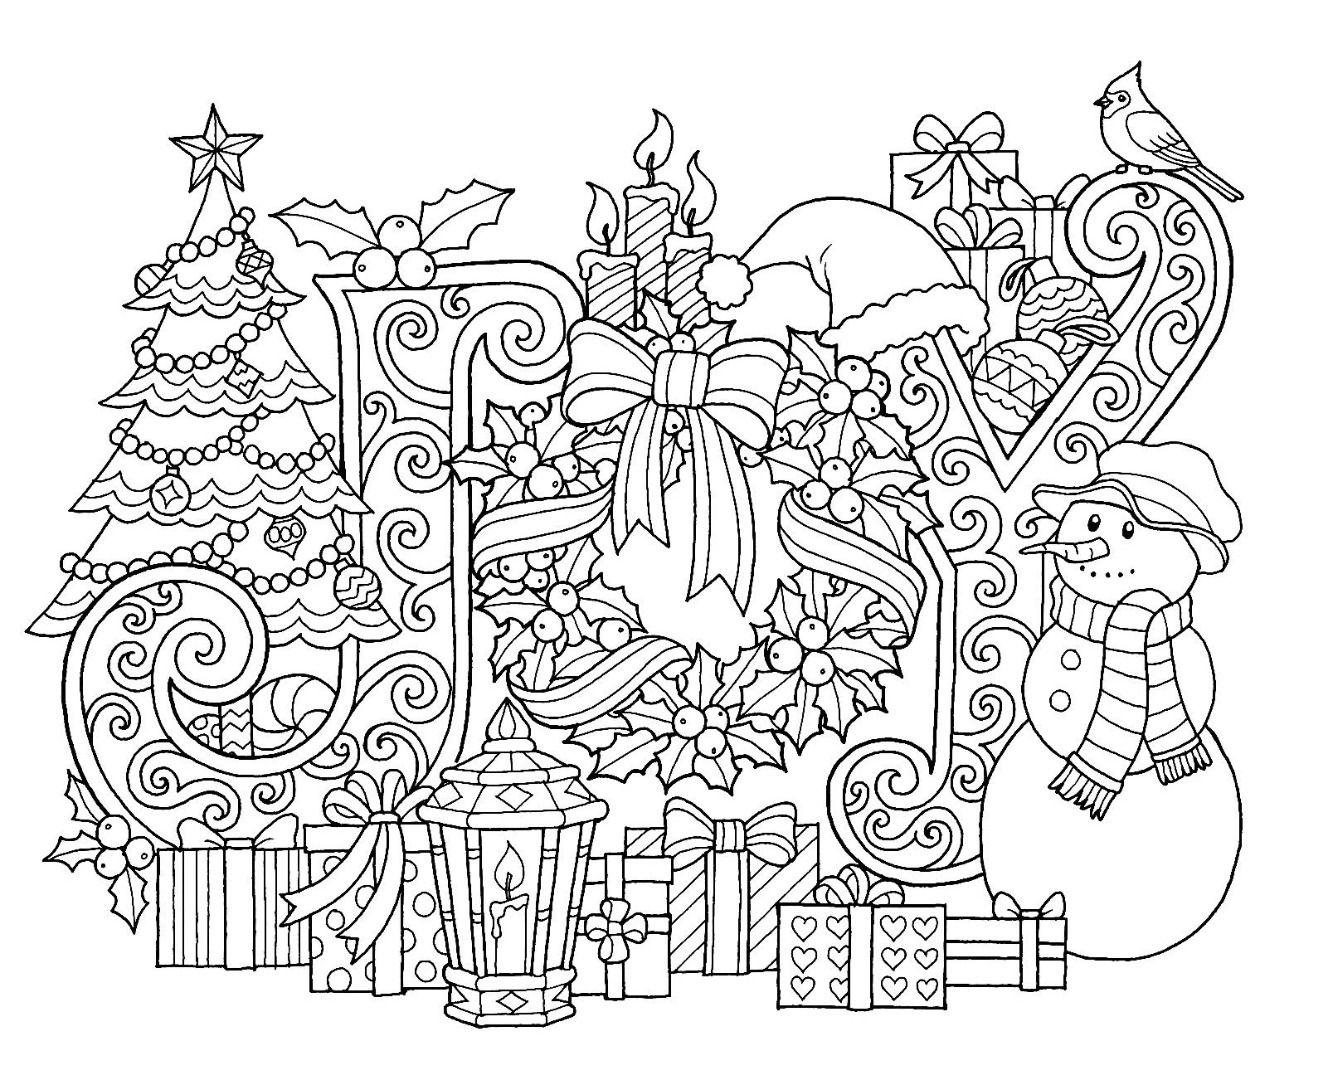 Christmas Joy Coloring Page Christmas Coloring Sheets Coloring Books Christmas Coloring Pages